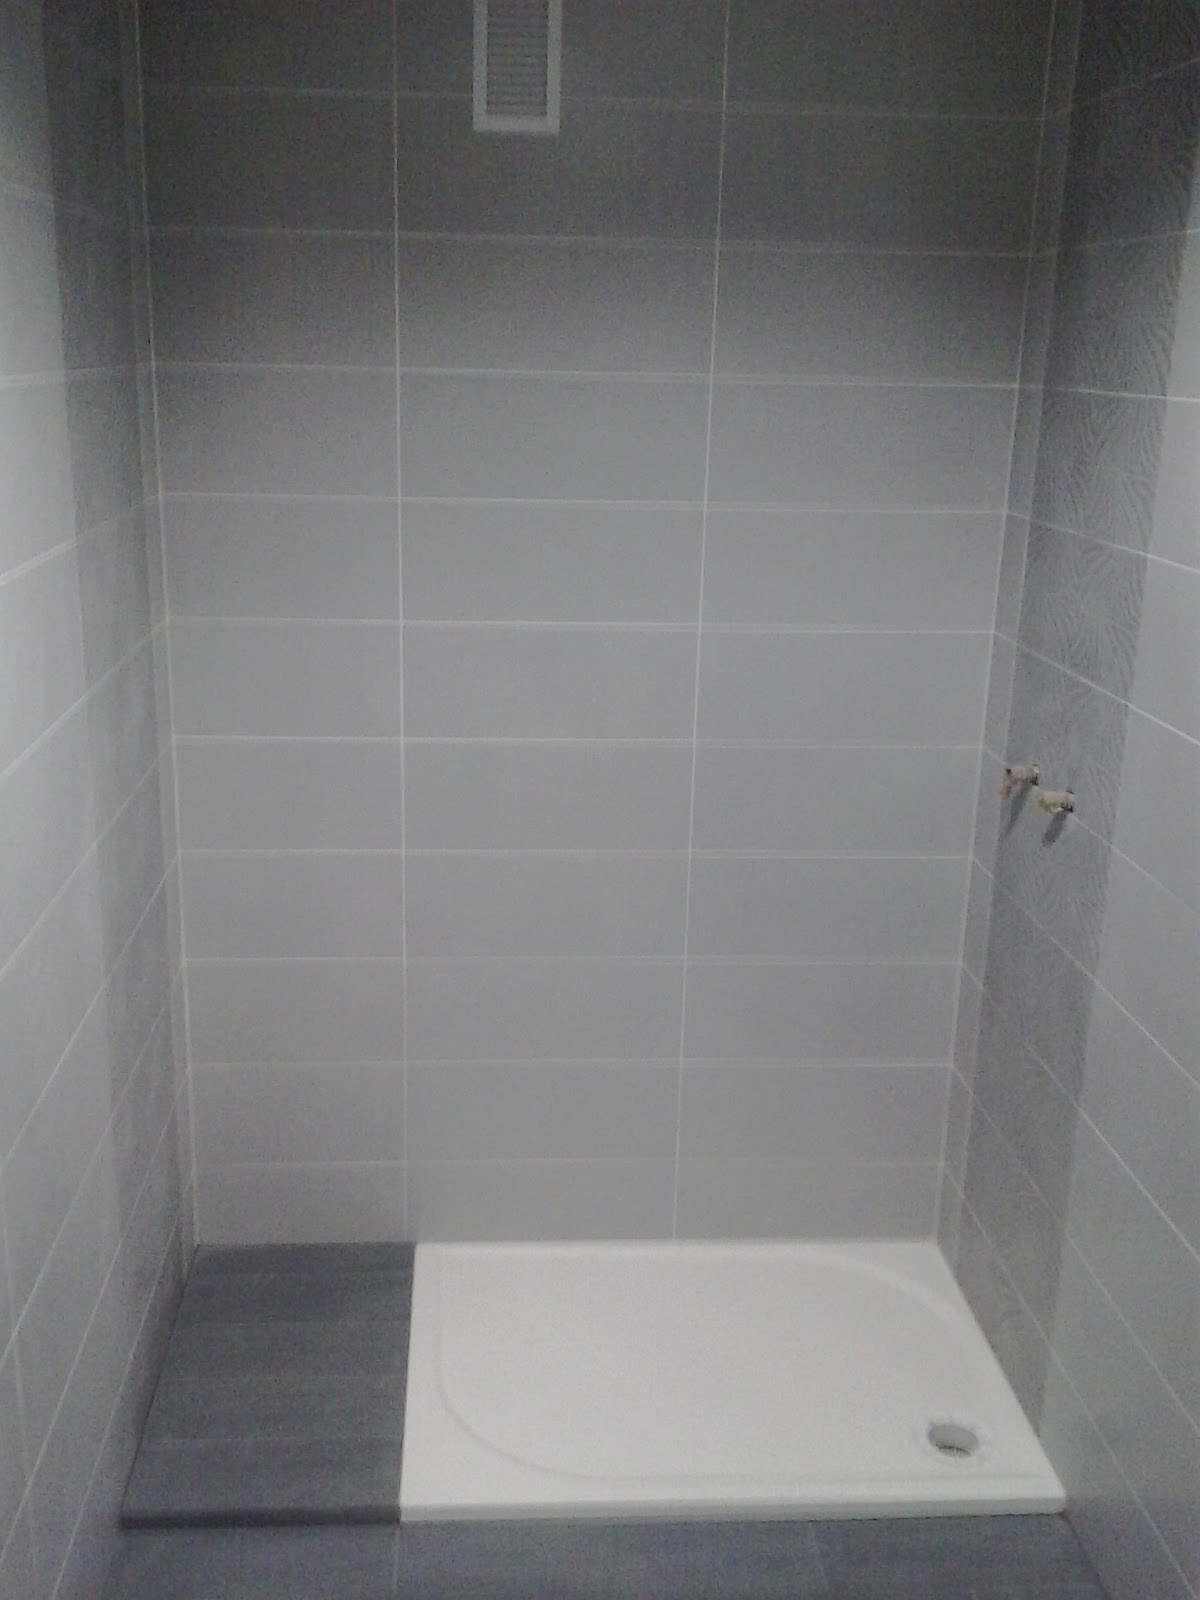 Baldosassa fotos e imagenes de platos de ducha for Desague ducha